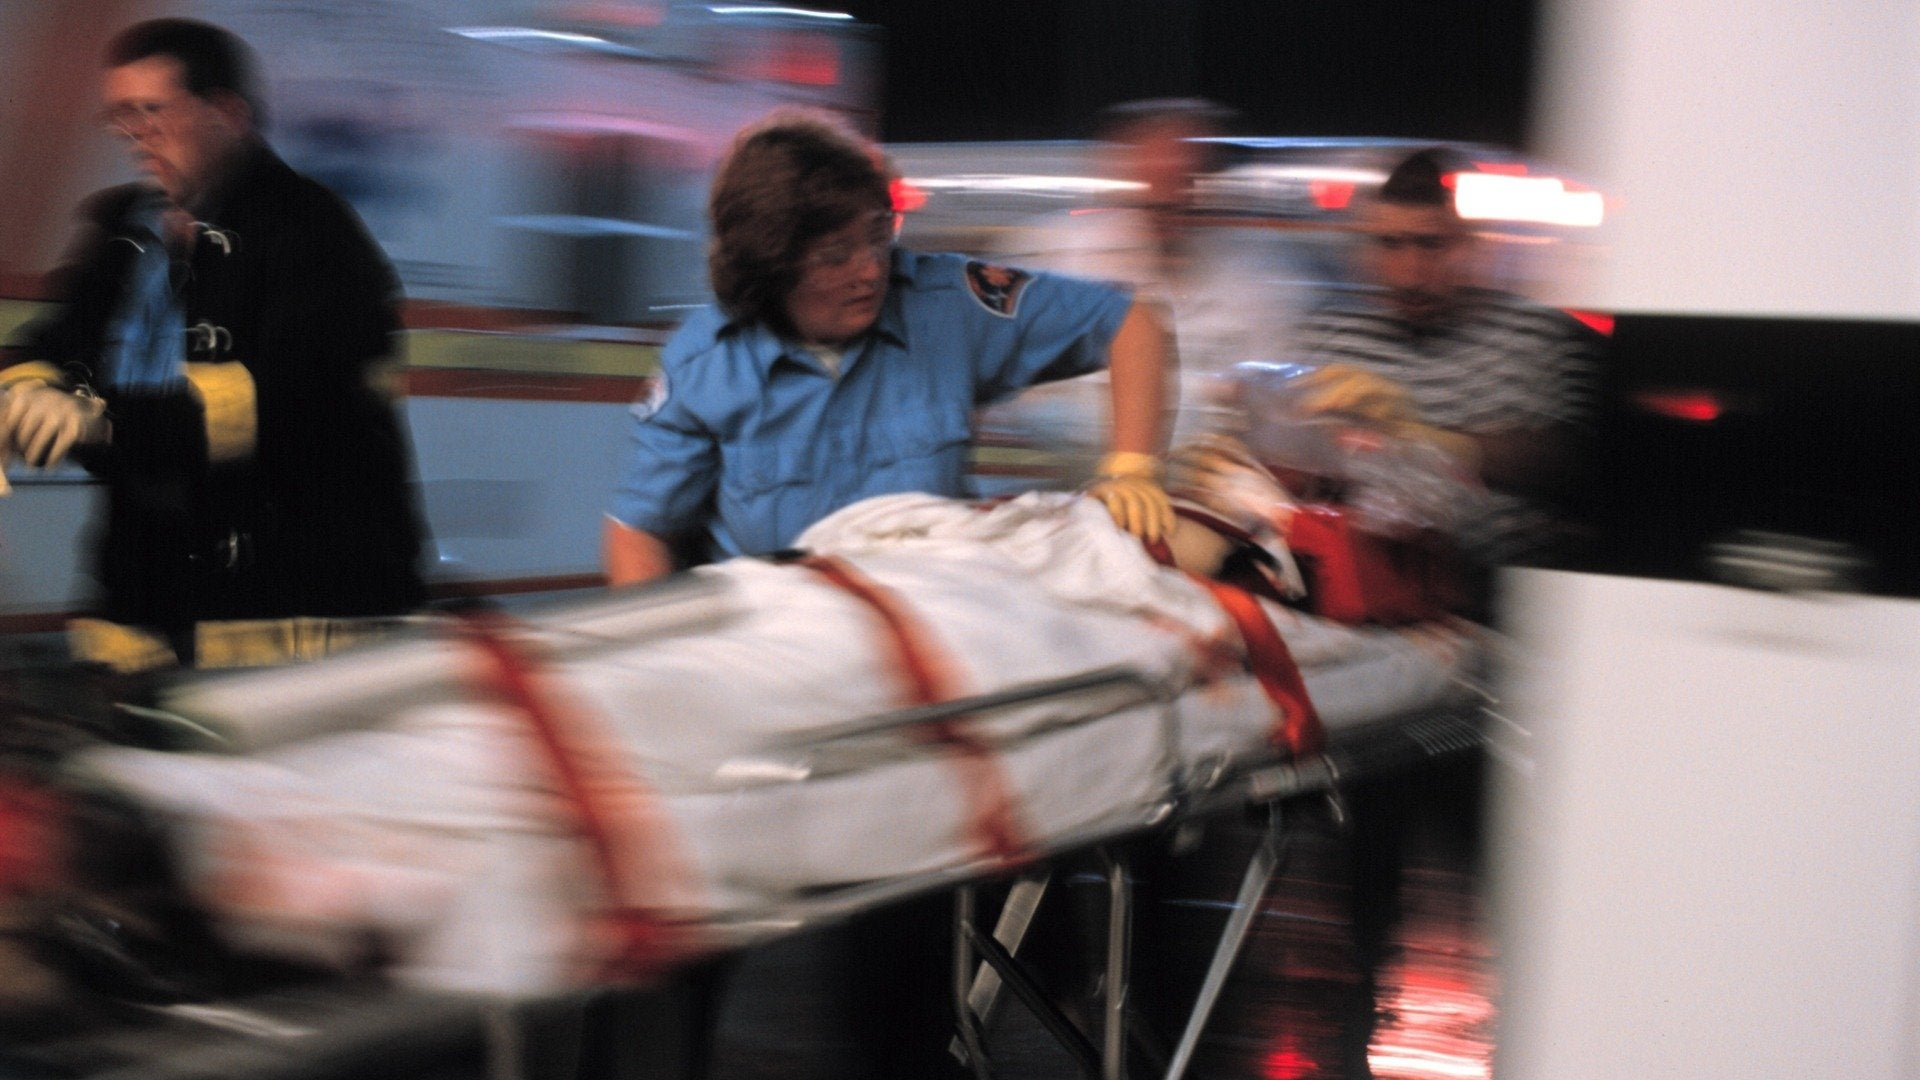 Untold Stories of the ER: Craziest Cases